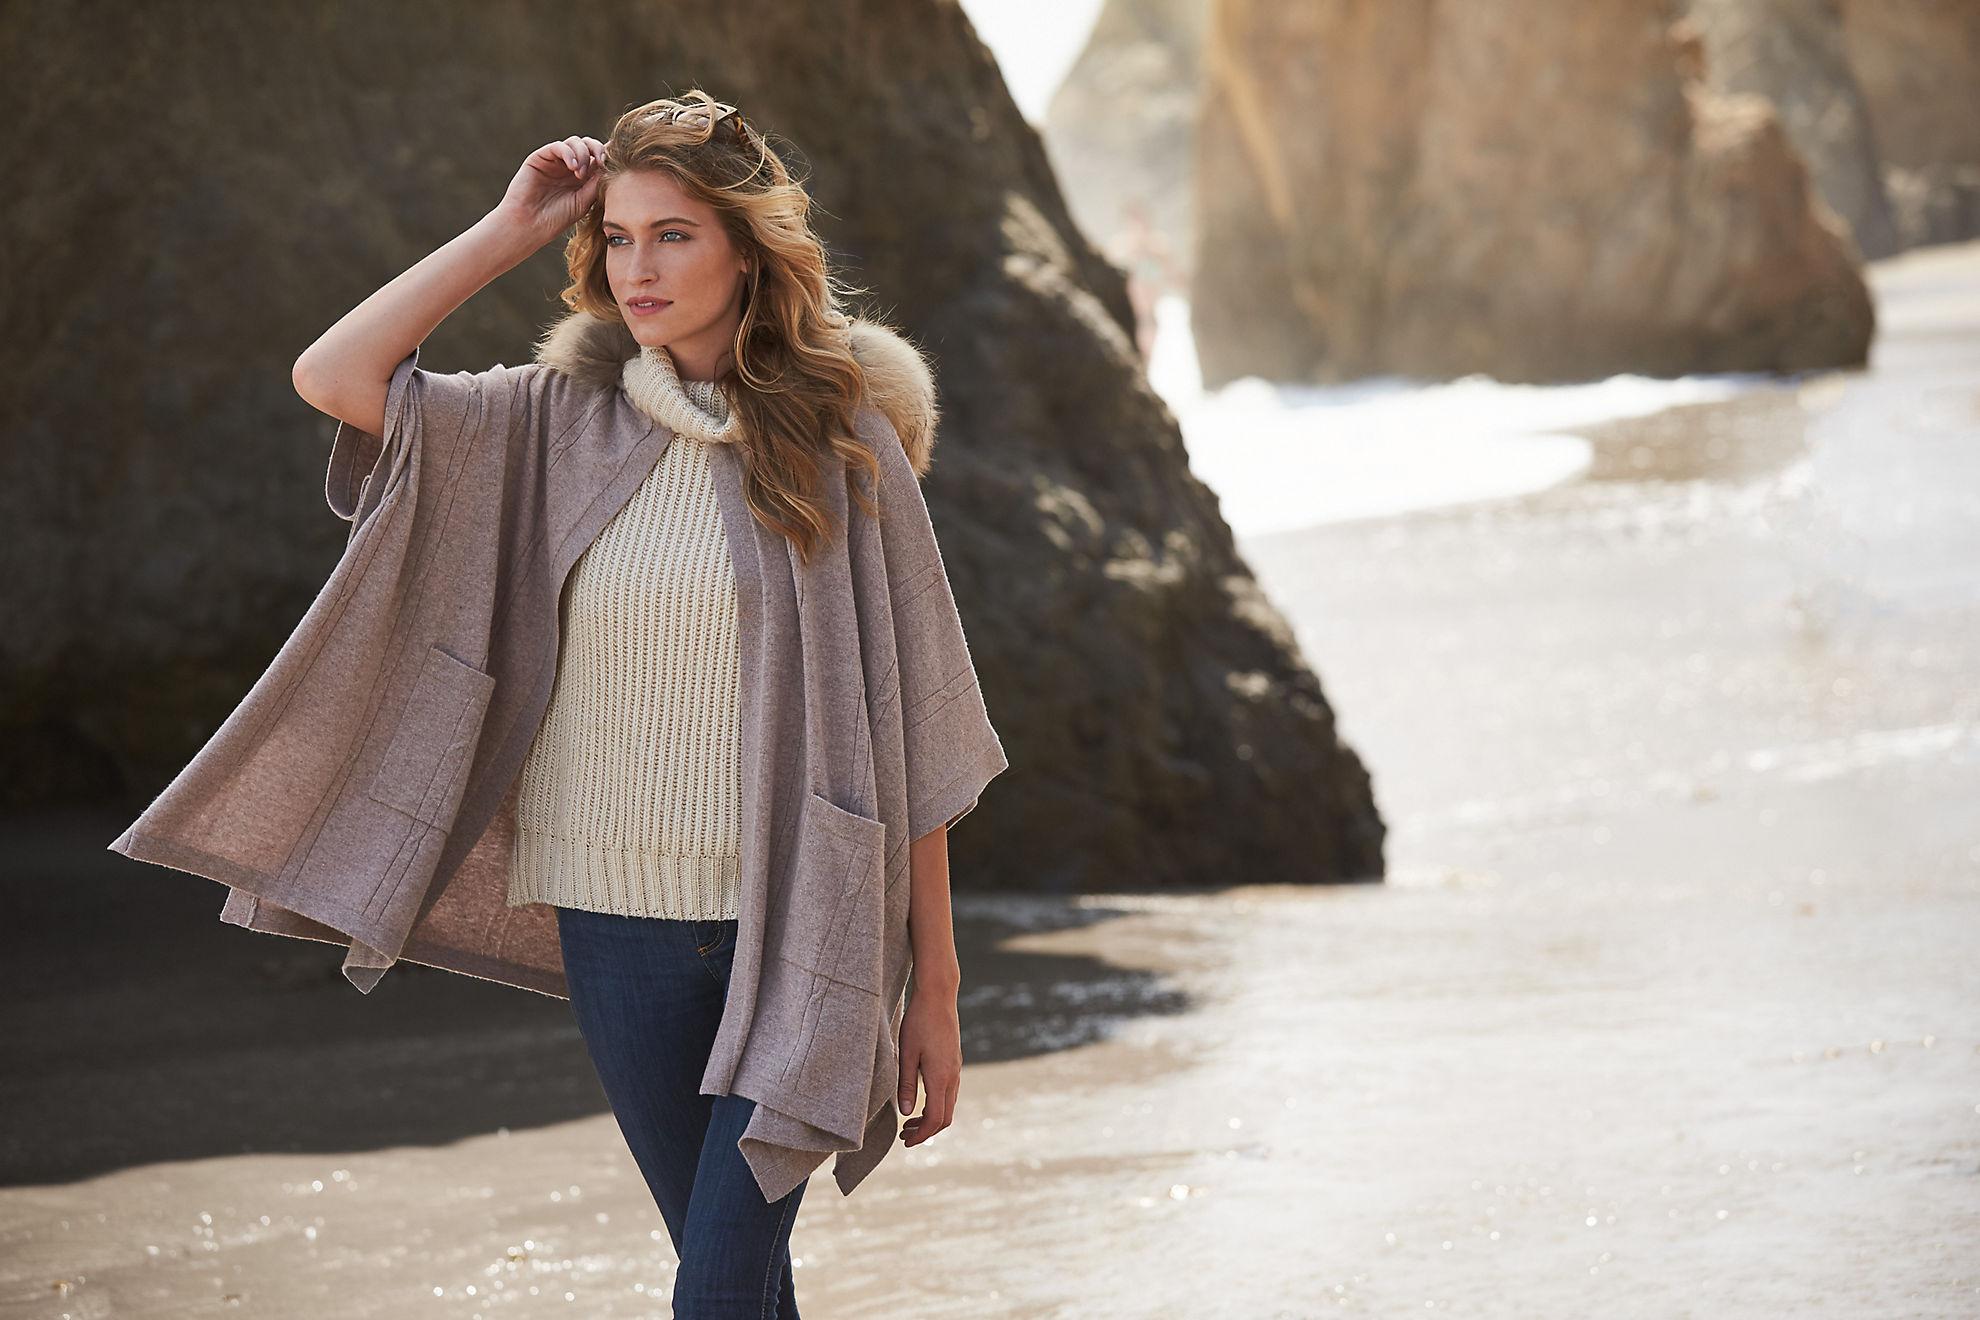 Eva Cashmere Hooded Sweater Cape with Detachable Raccoon Fur Trim